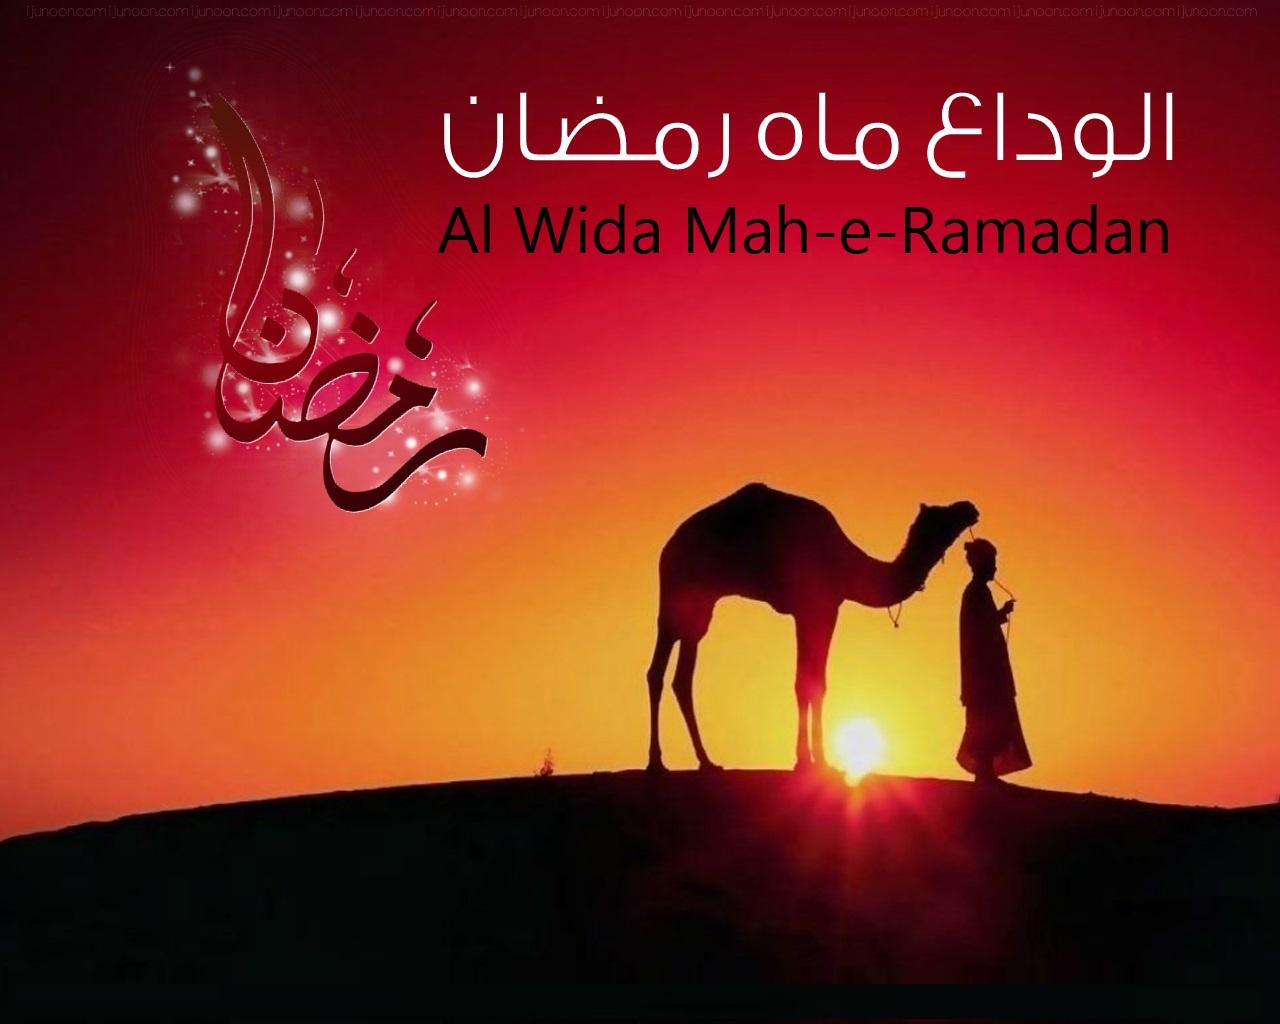 Ramadan Mubarak Images Dp For Facebook And Whatsapp